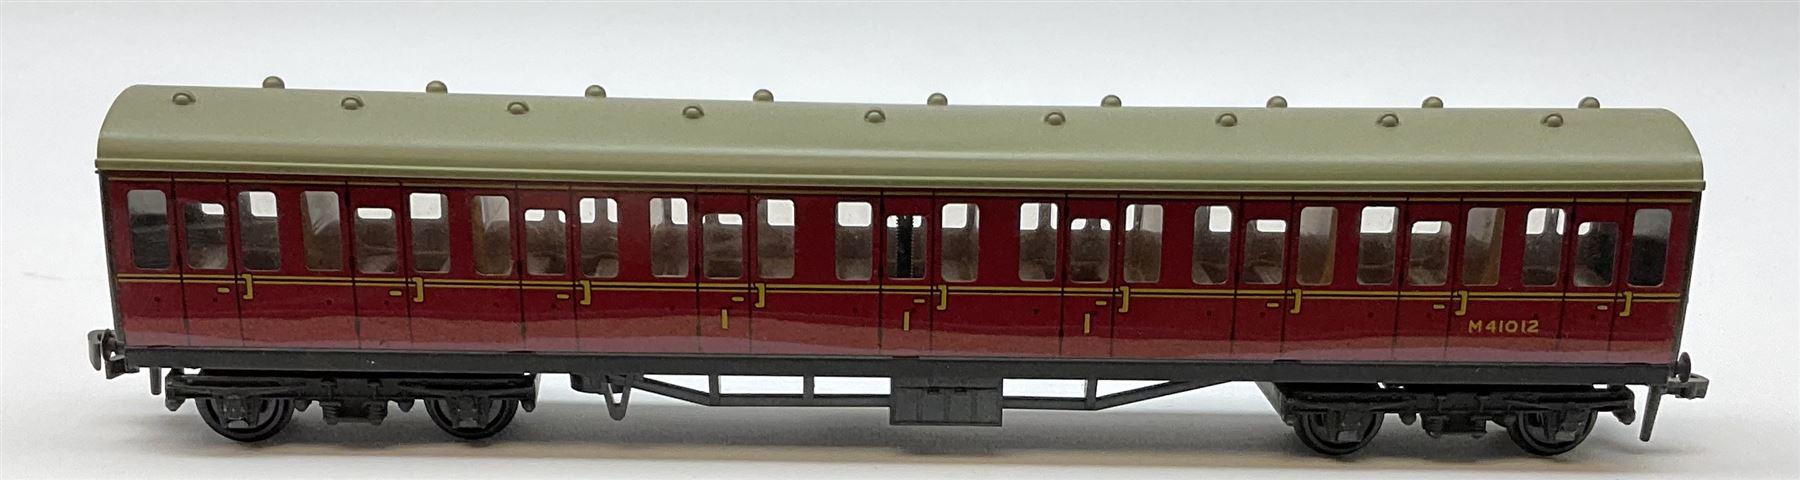 Hornby Dublo - 4075 Passenger Brake Van B.R.; 4078 Composite Sleeping Car B.R.; 4082 Suburban Coach - Image 4 of 5